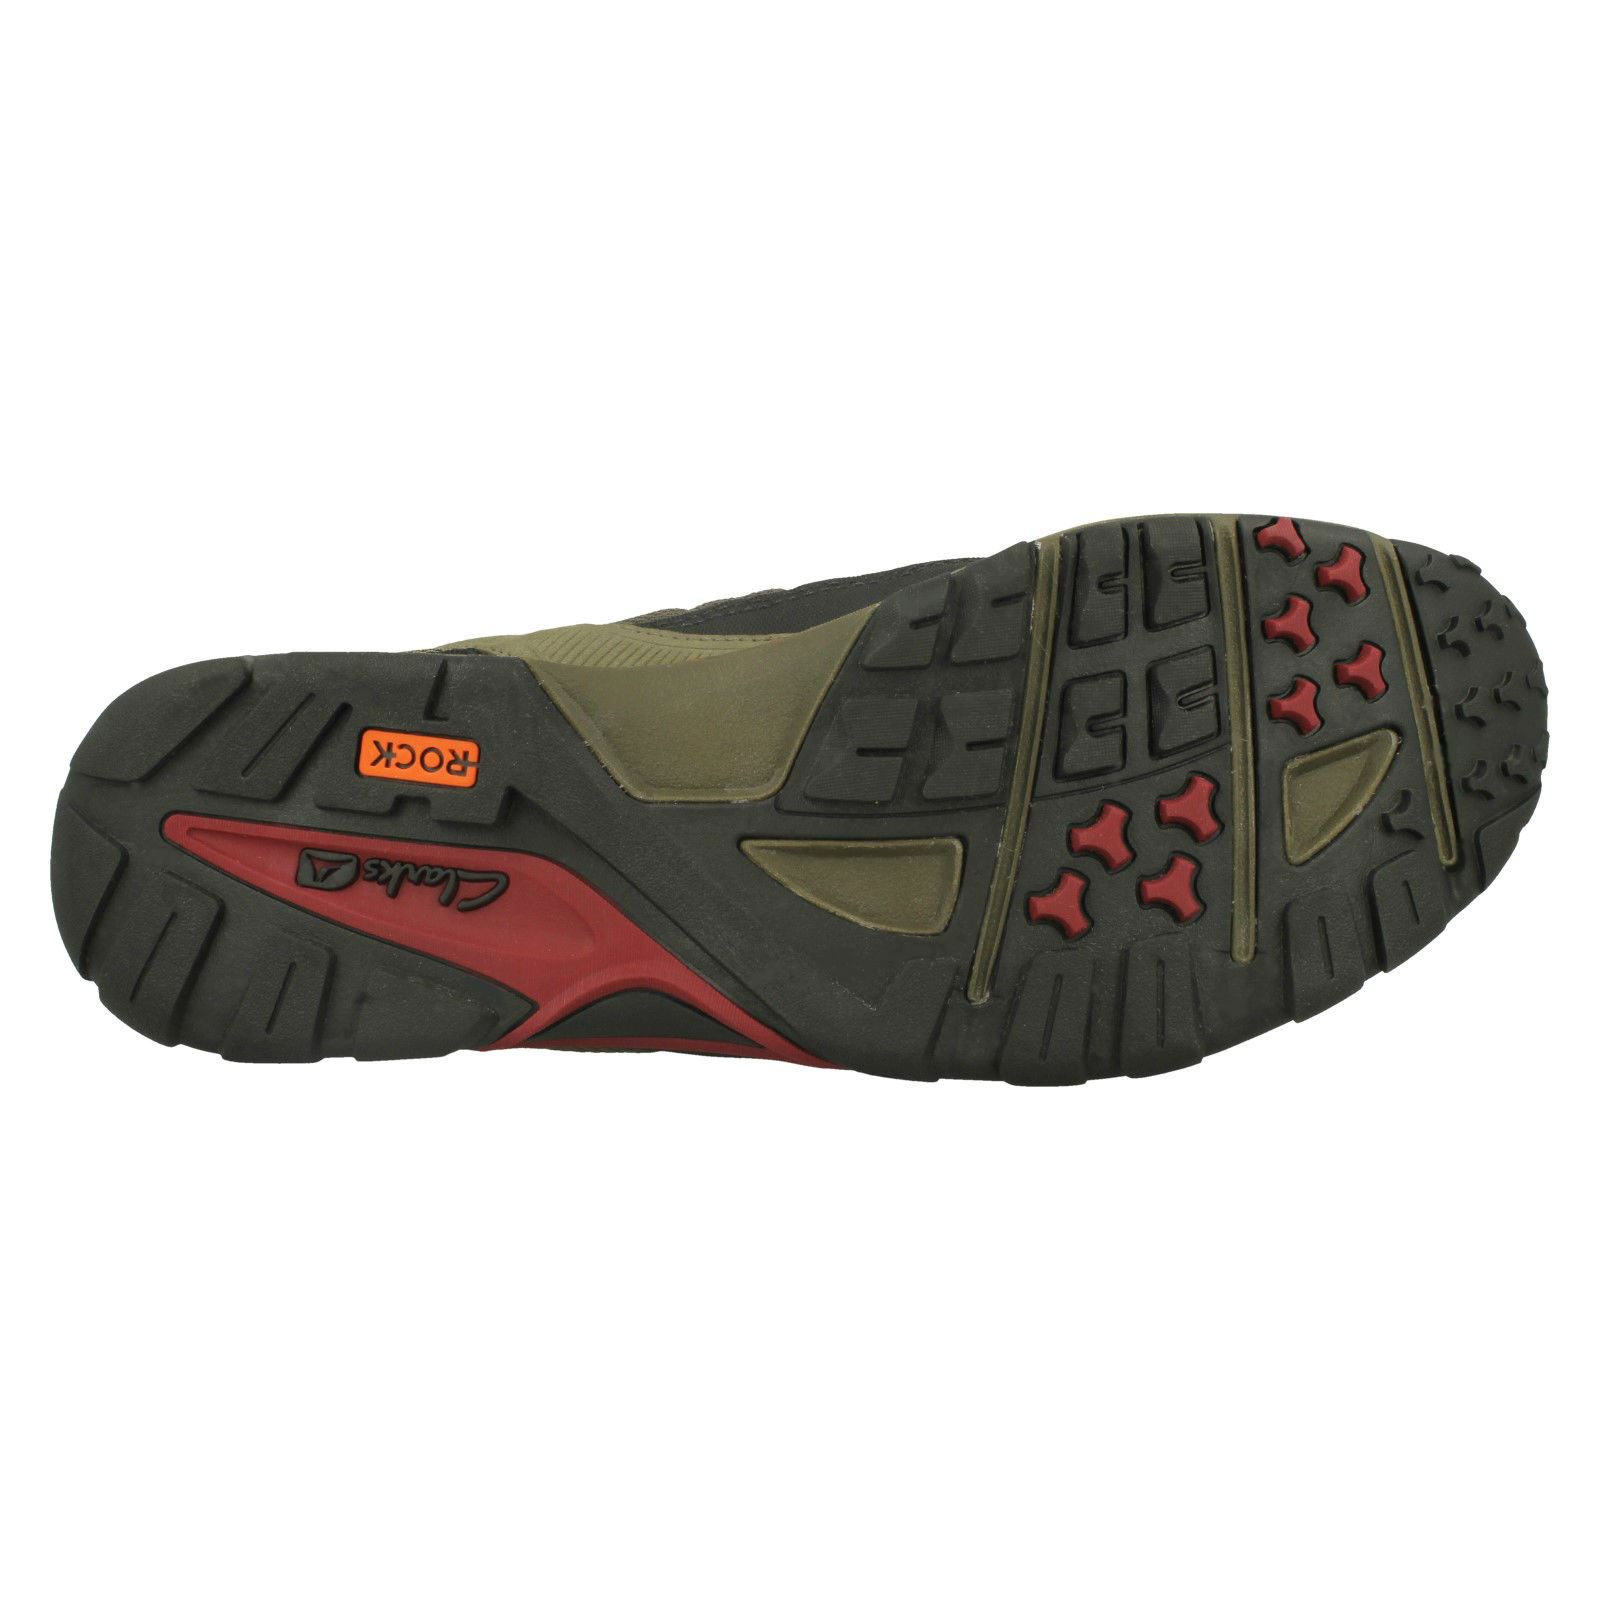 Gore 'overide Clarks Boots Ankle Green Gtx' Hi tex Mens Uwg5axg